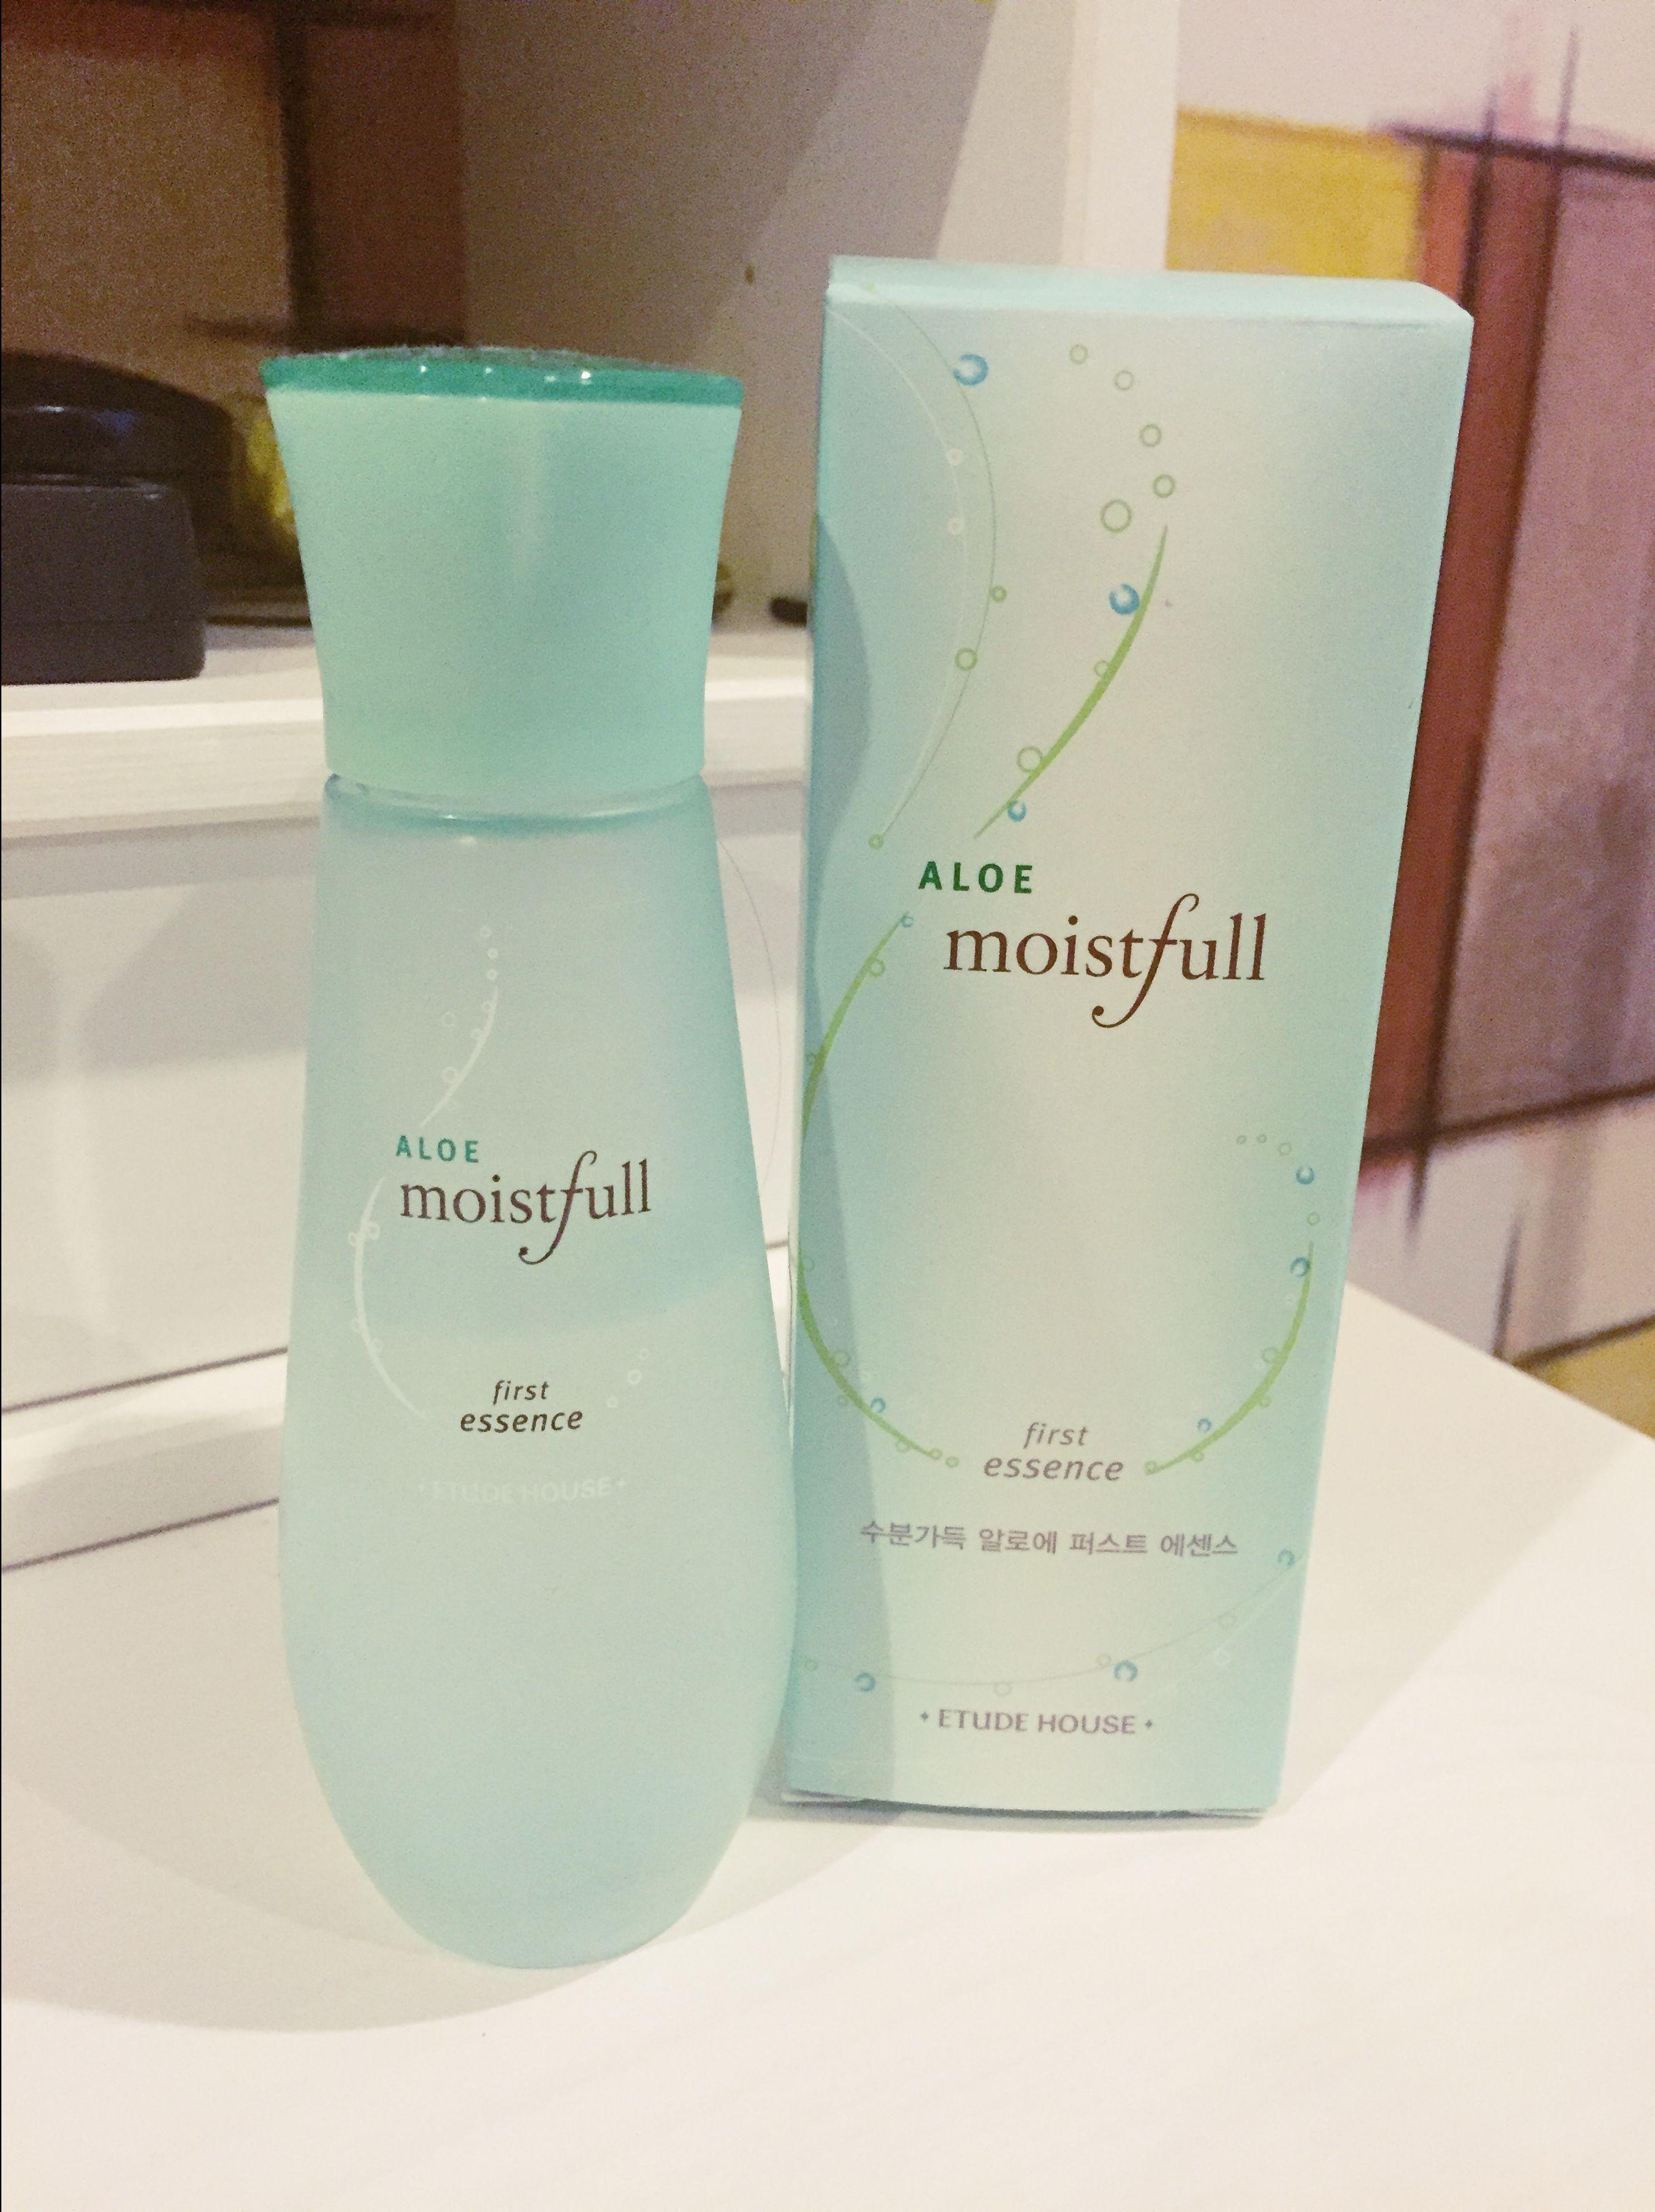 Review Moistfull Aloe First Essence Etude House Dry Skin Types Oily Skin Skin Moisturizer